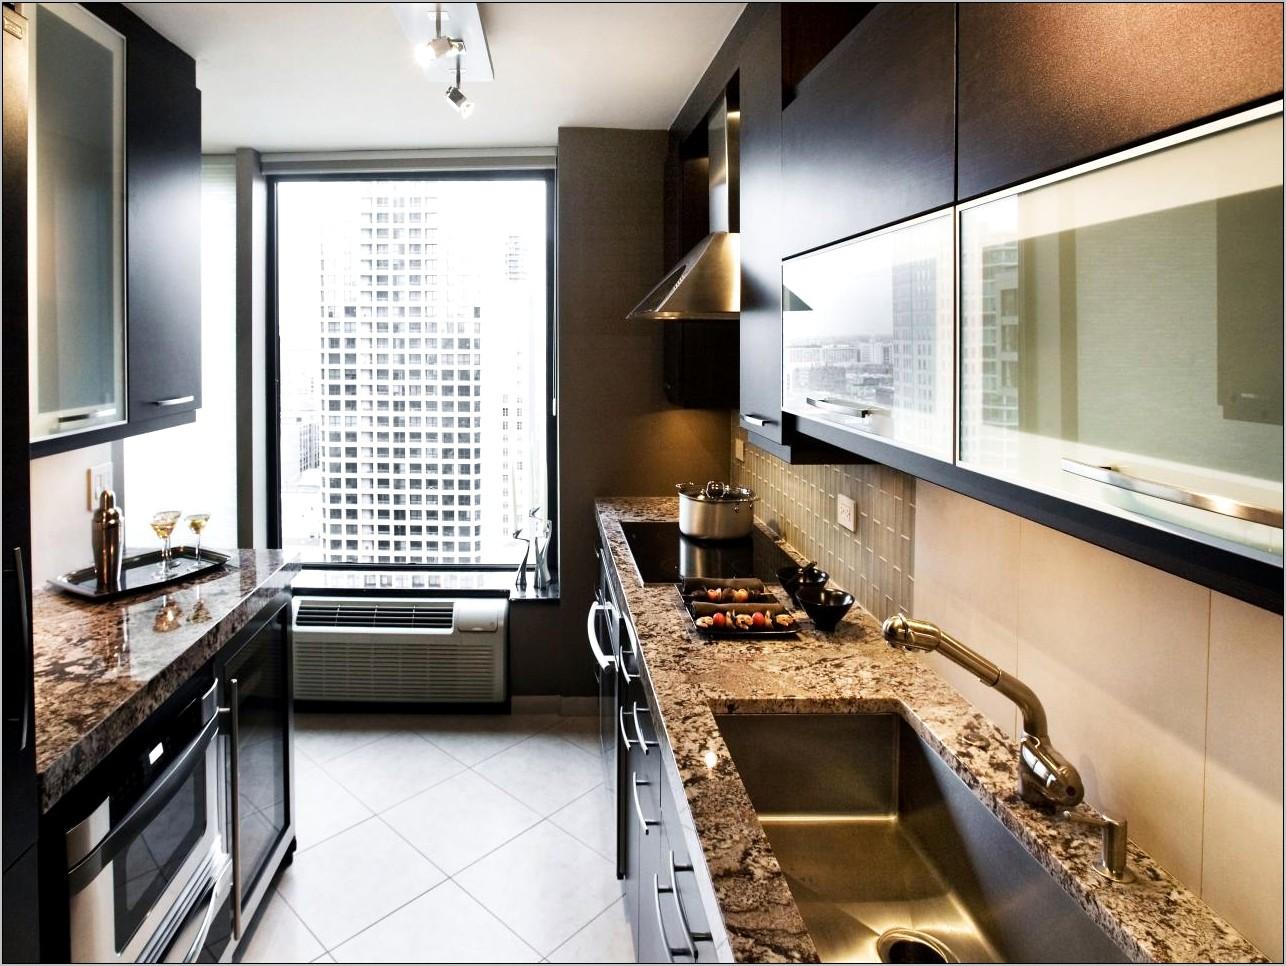 Best Decorative Ideas For Kitchen Passtgrough Spaces